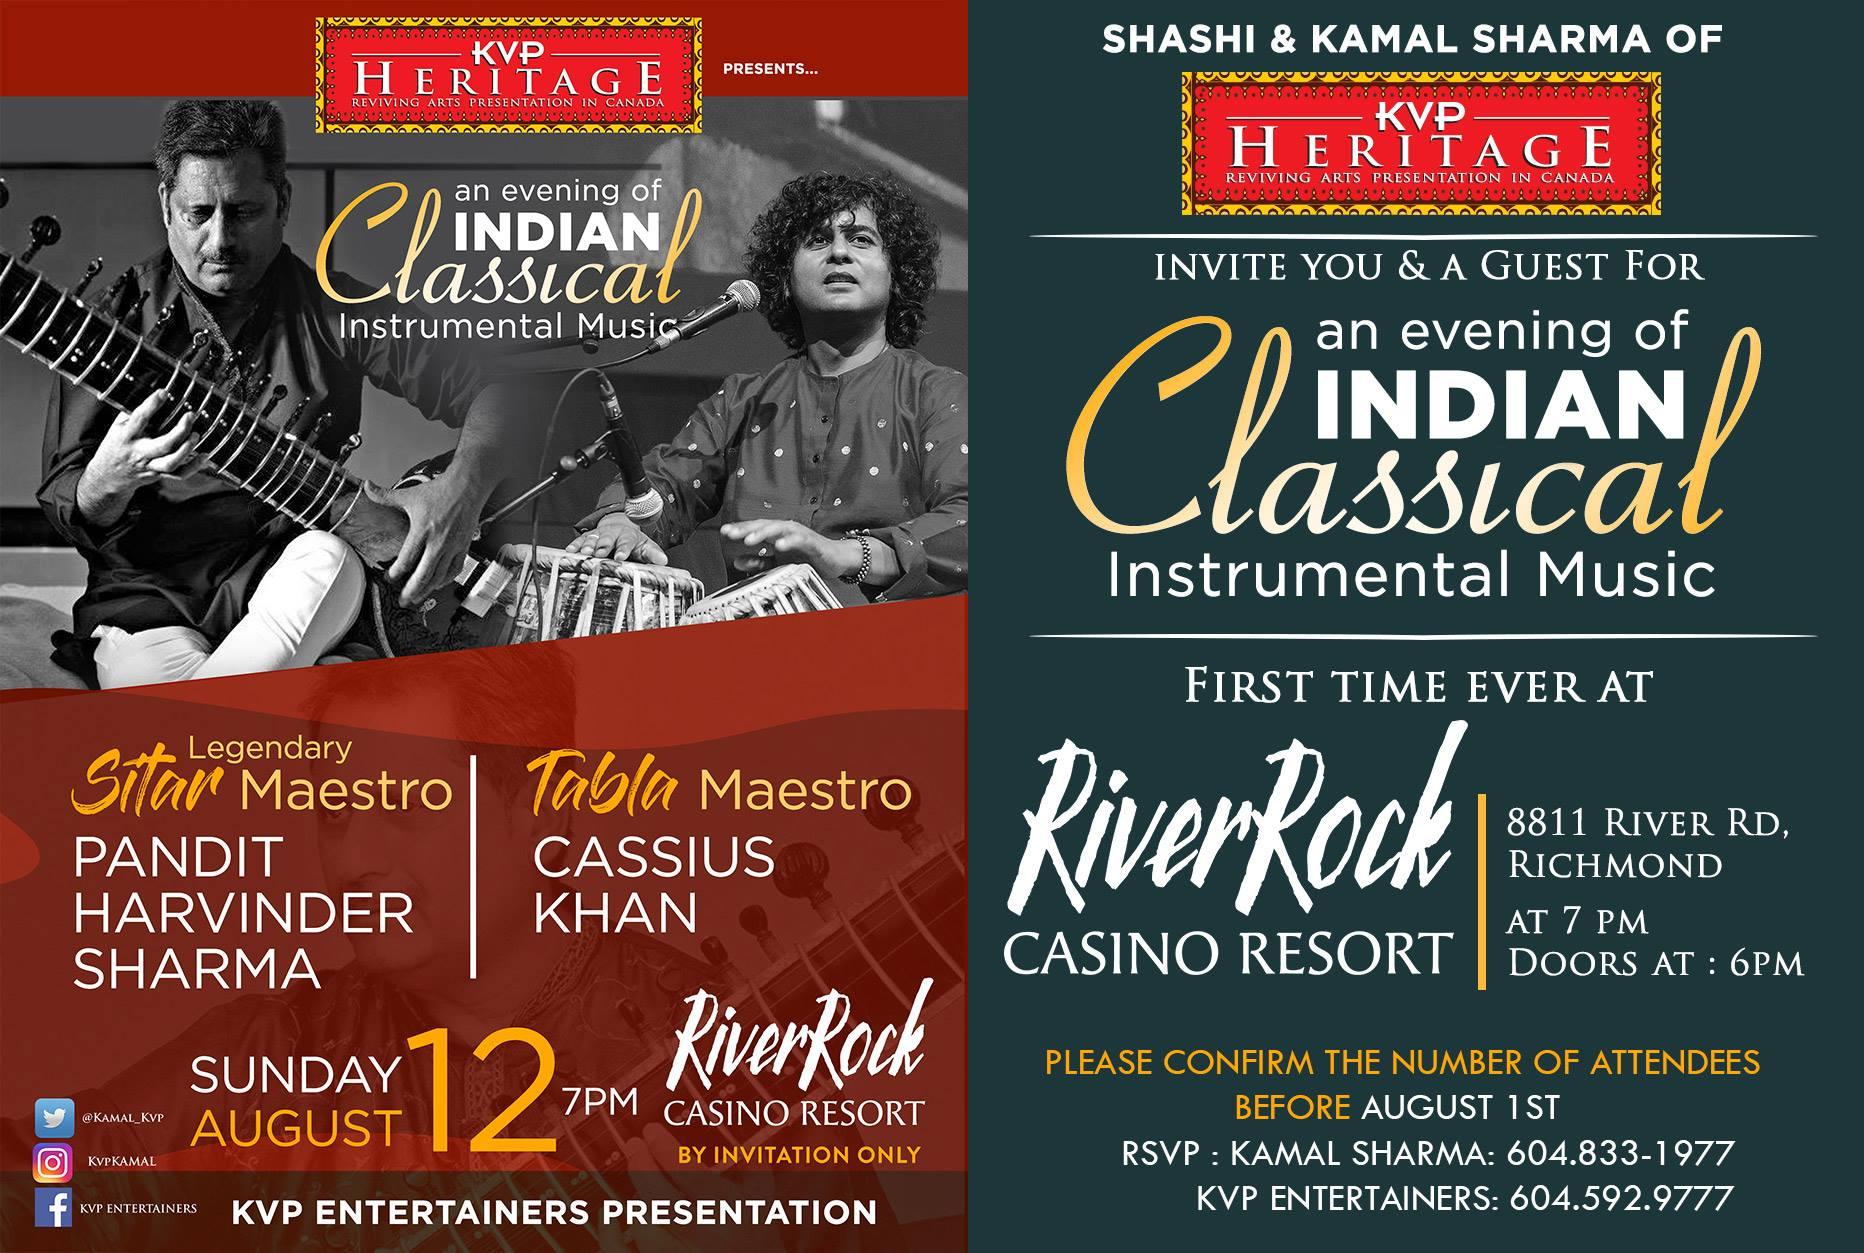 Pandit Harvinder Sharma & Cassius Khan